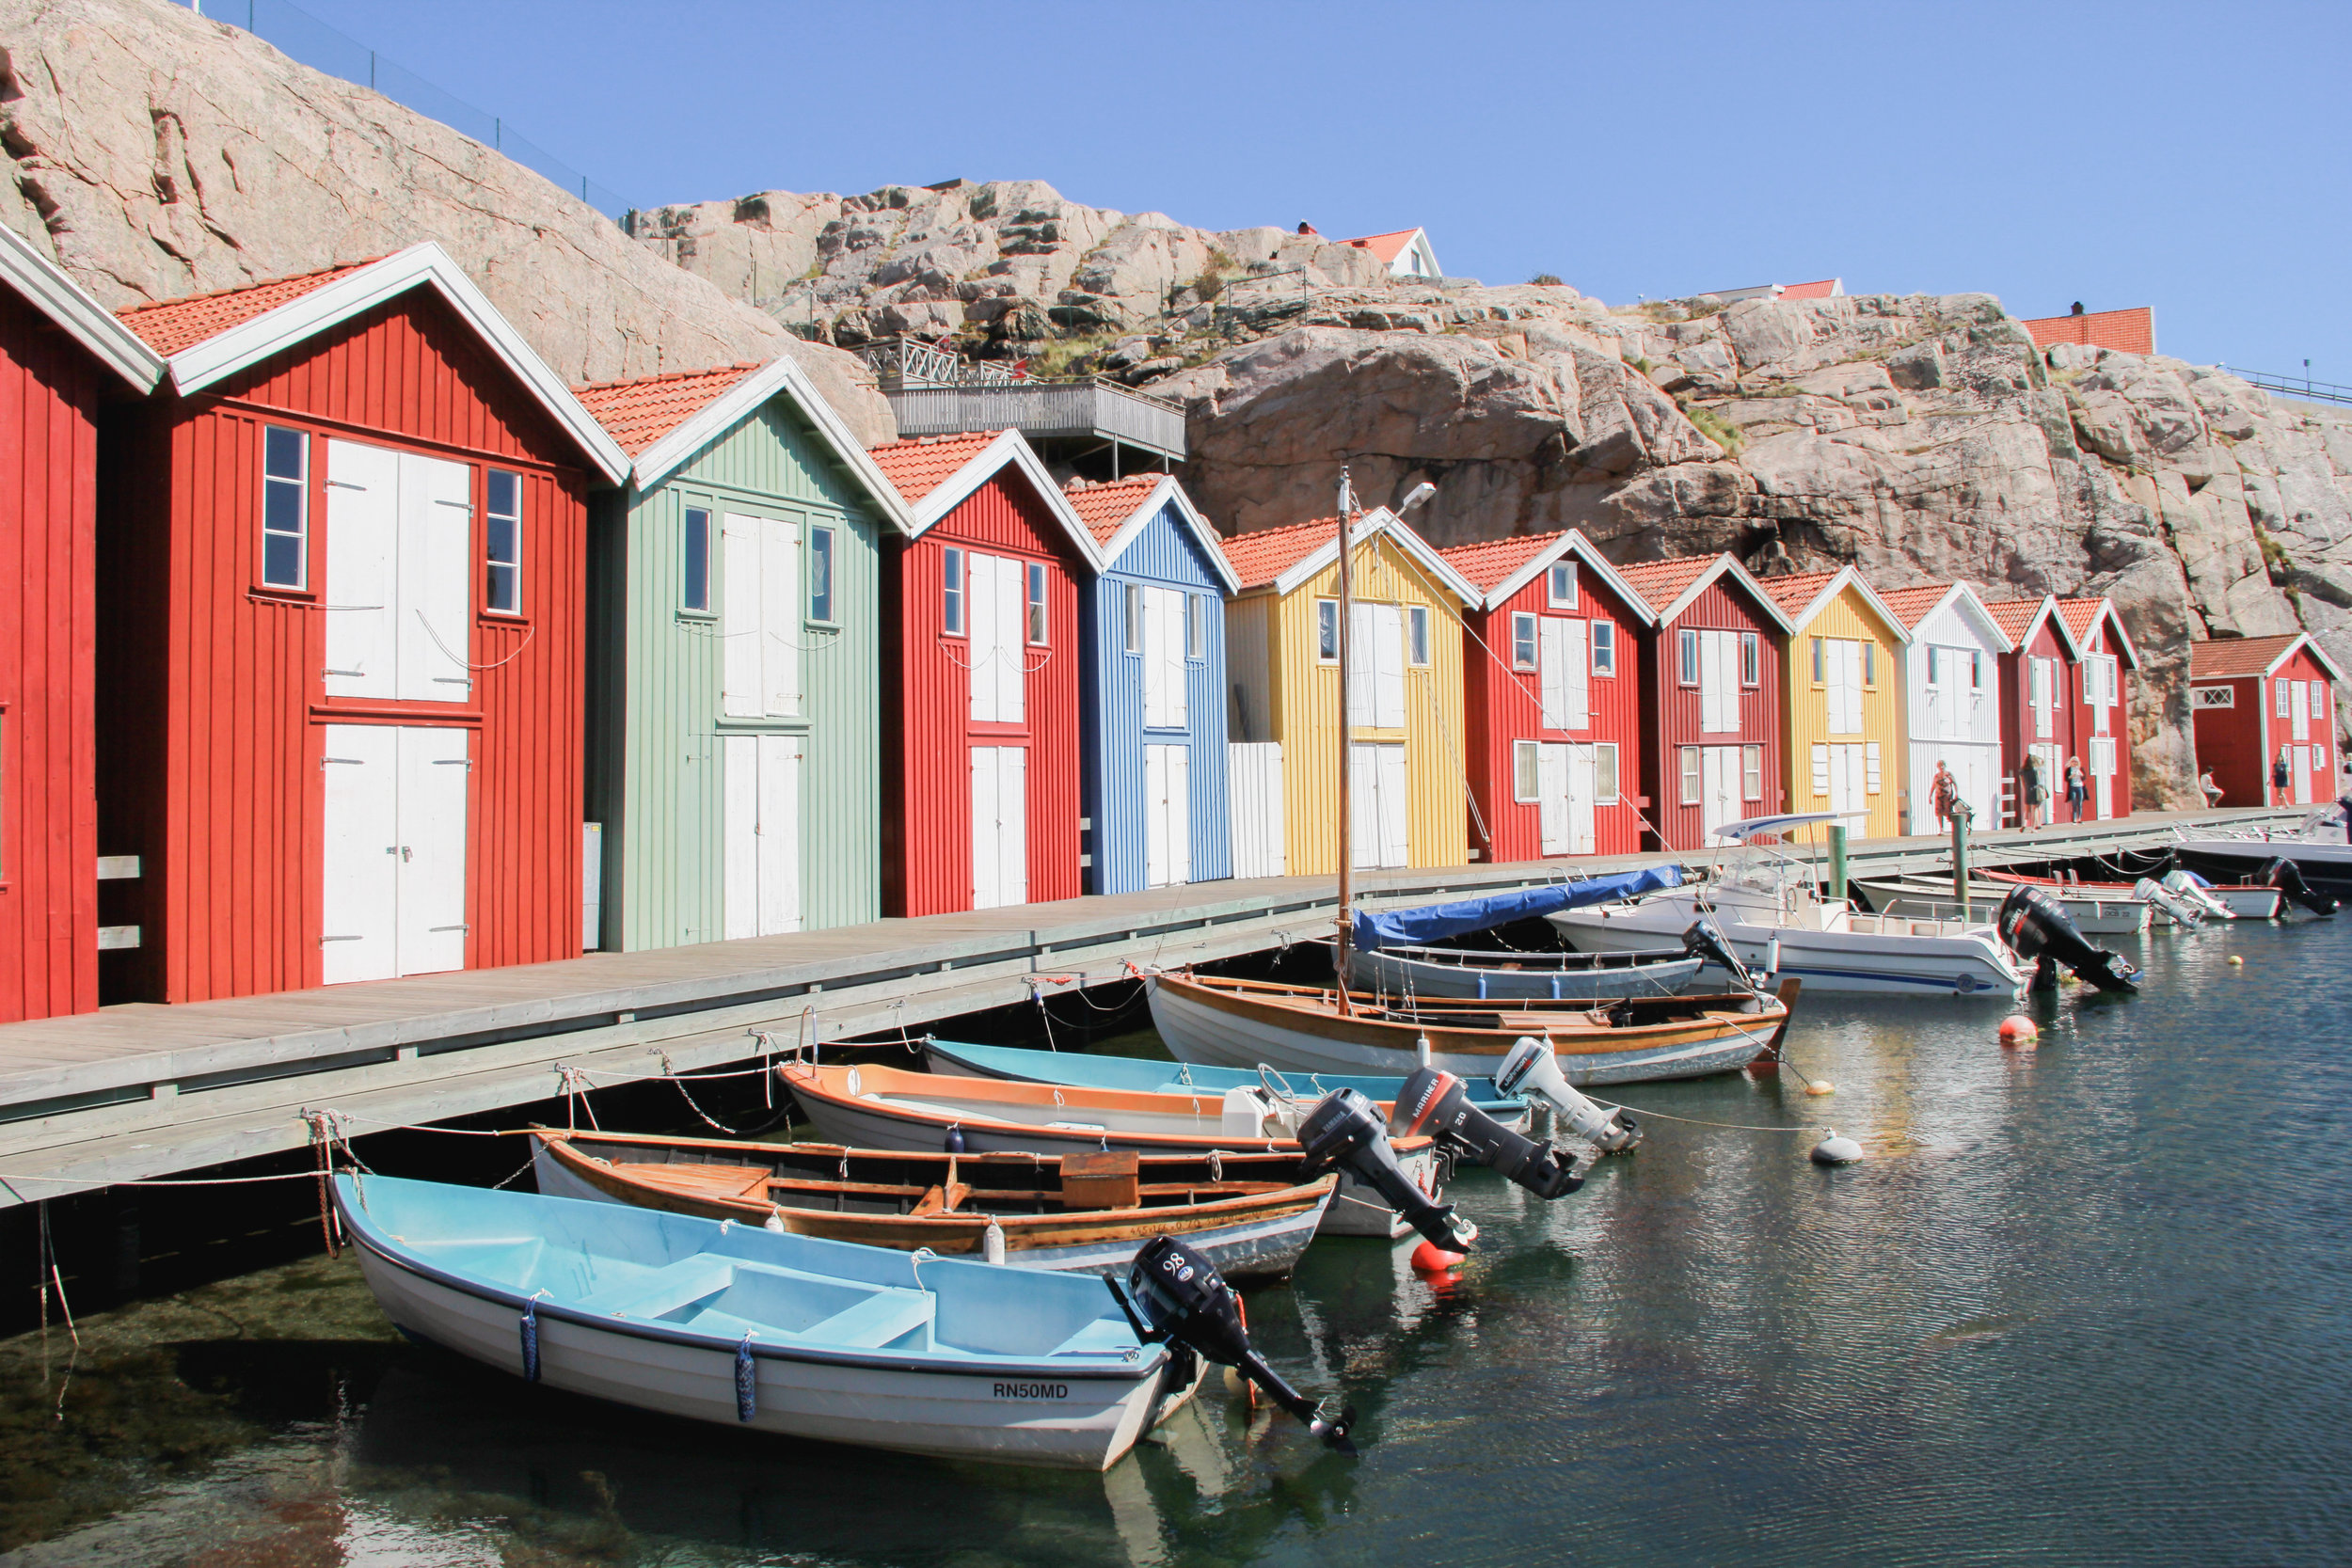 Bohulsan Coast Where the Swedes Summer-44.jpg